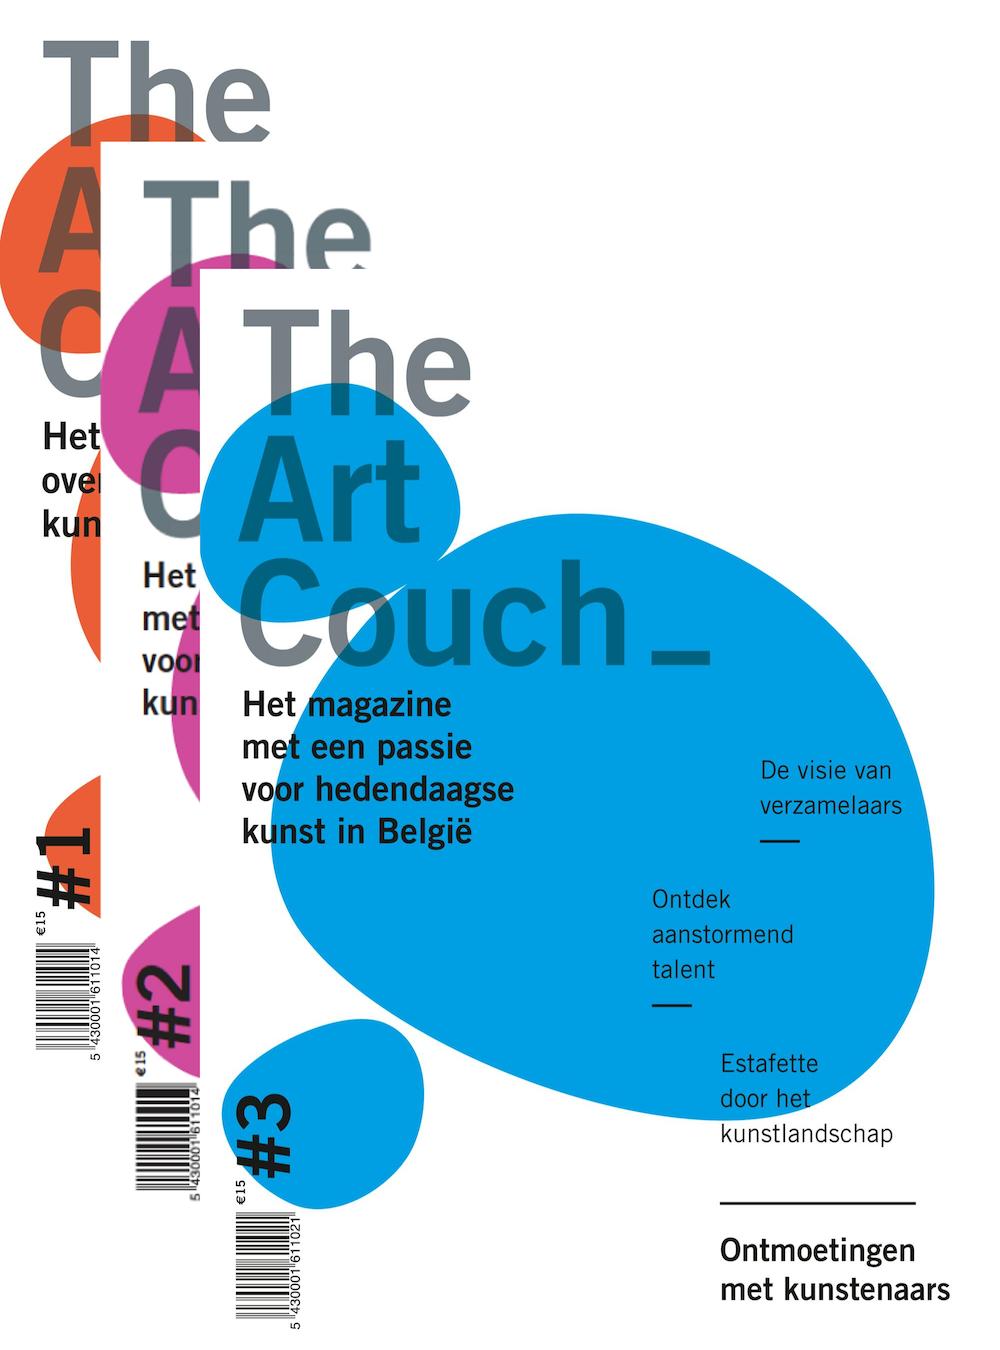 TheArtCouch magazine